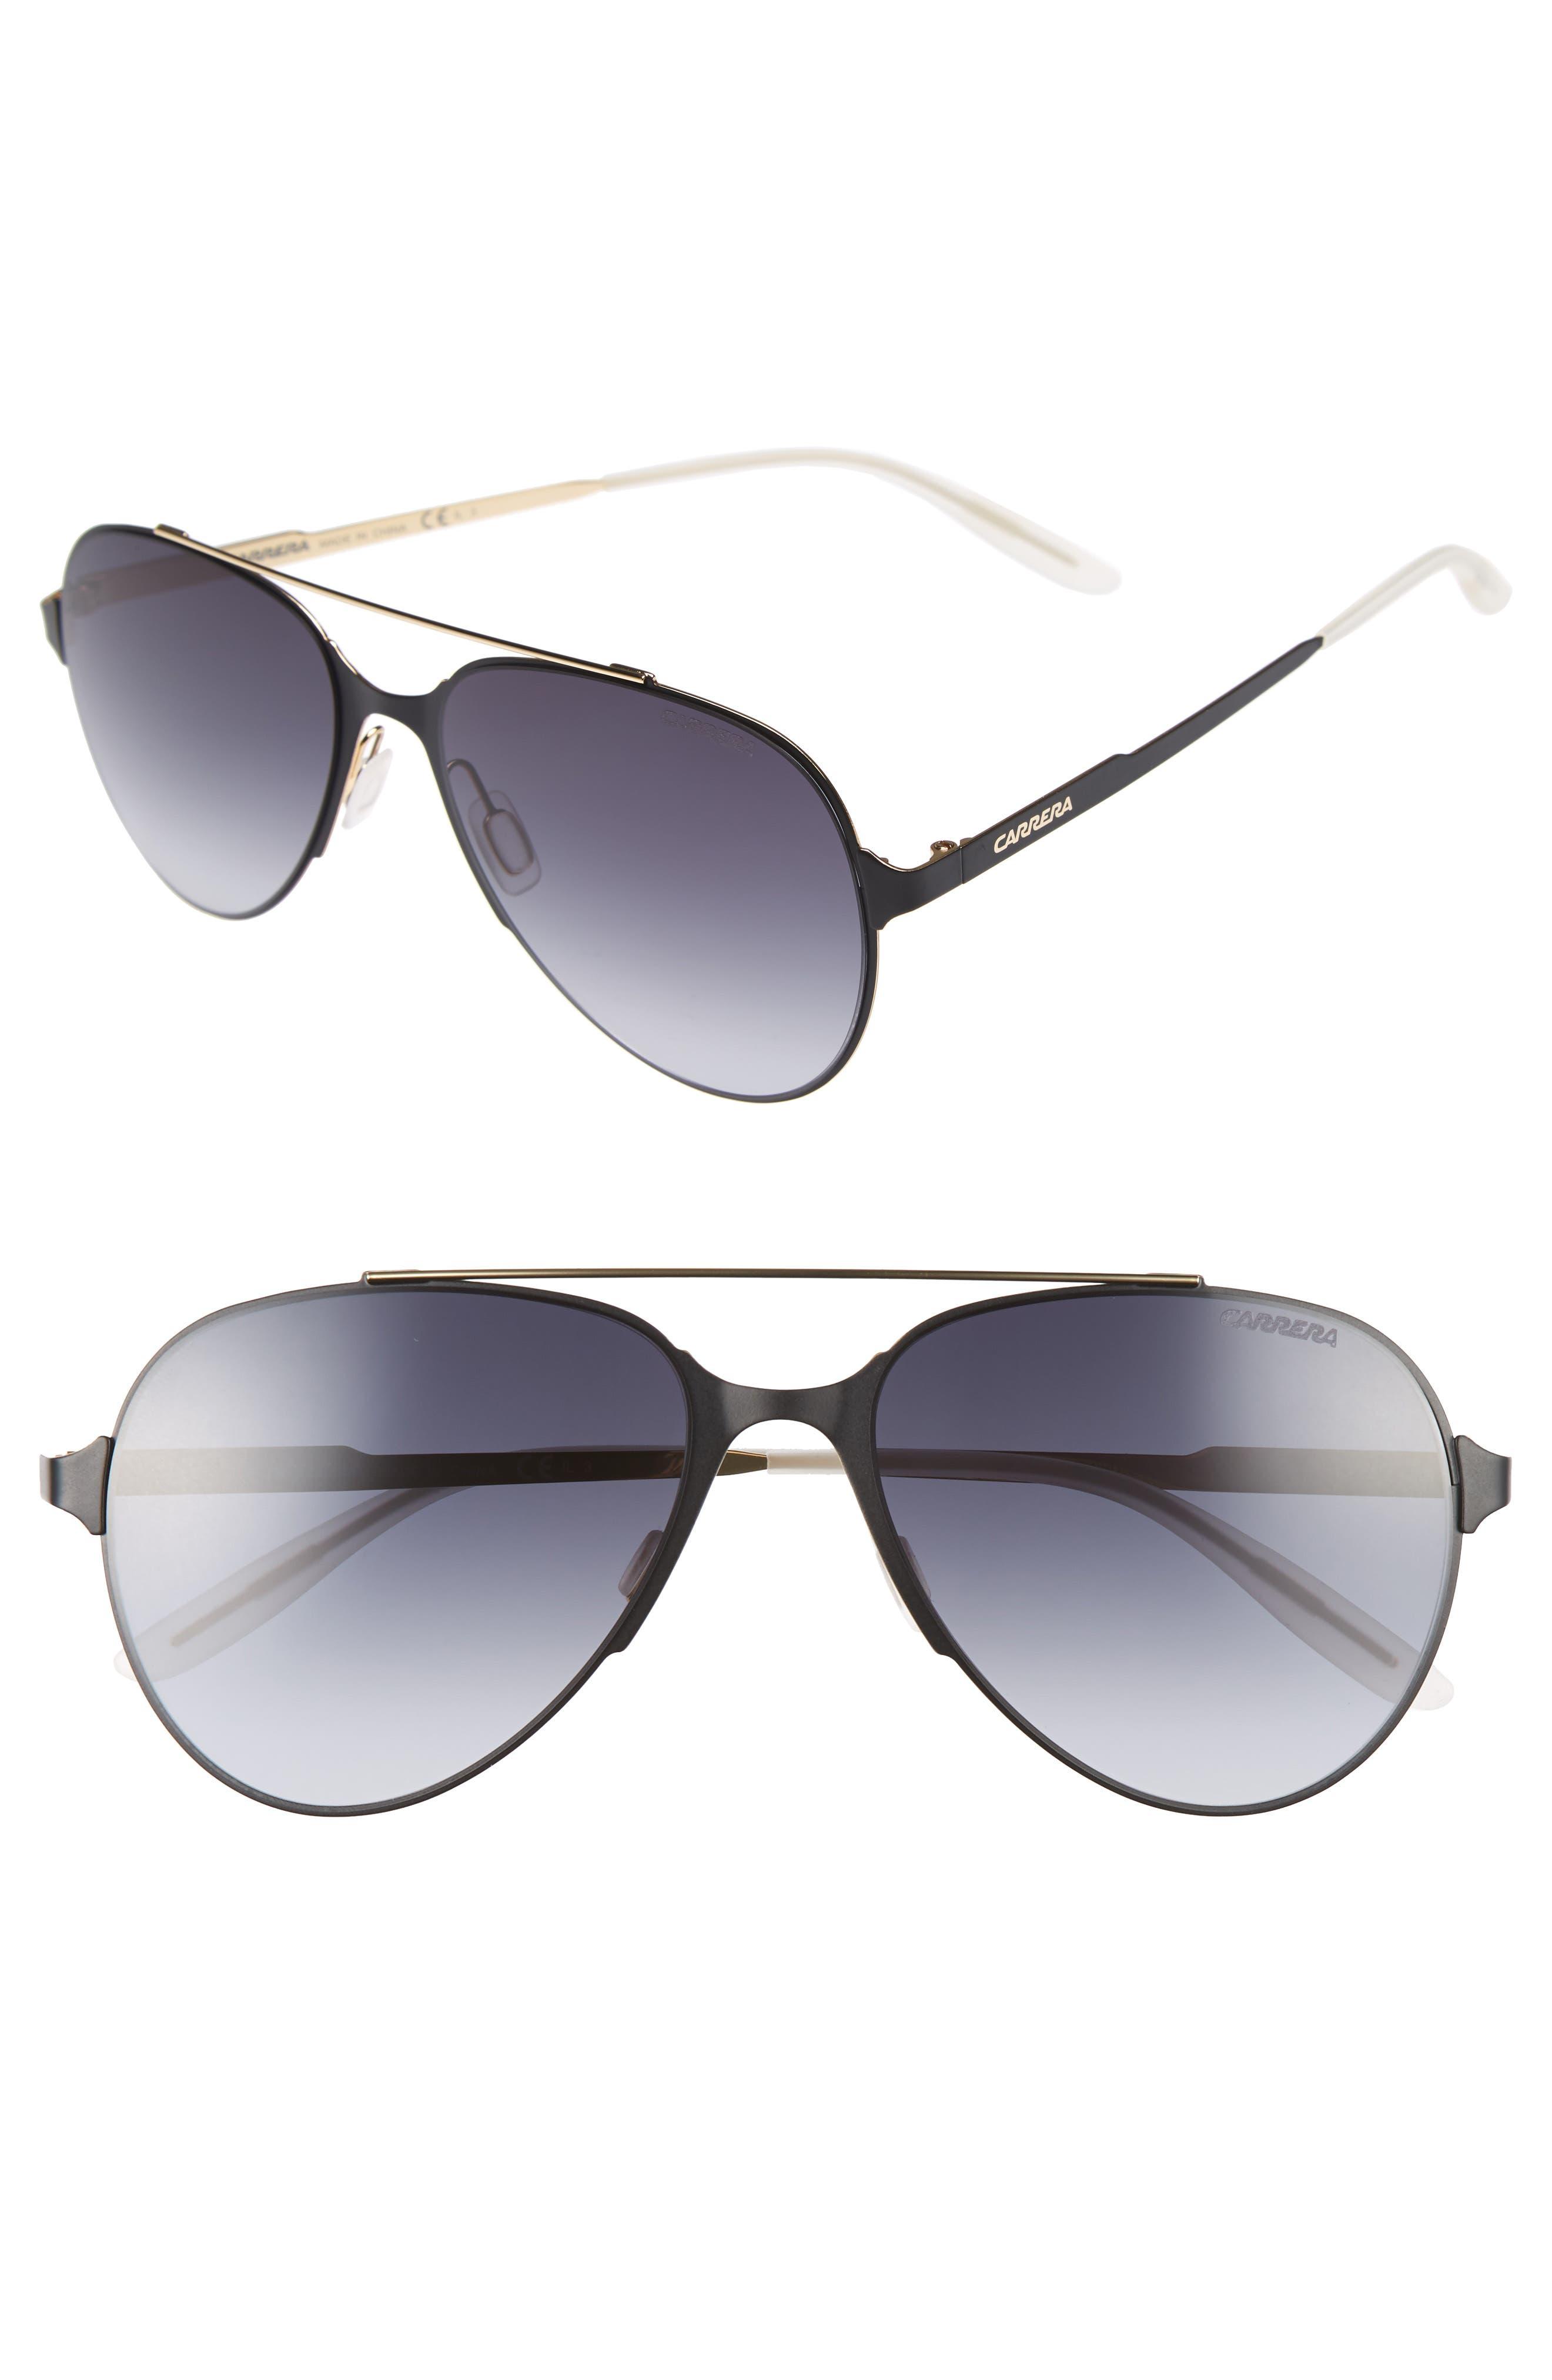 Main Image - Carrera Eyewear 55mm Aviator Sunglasses